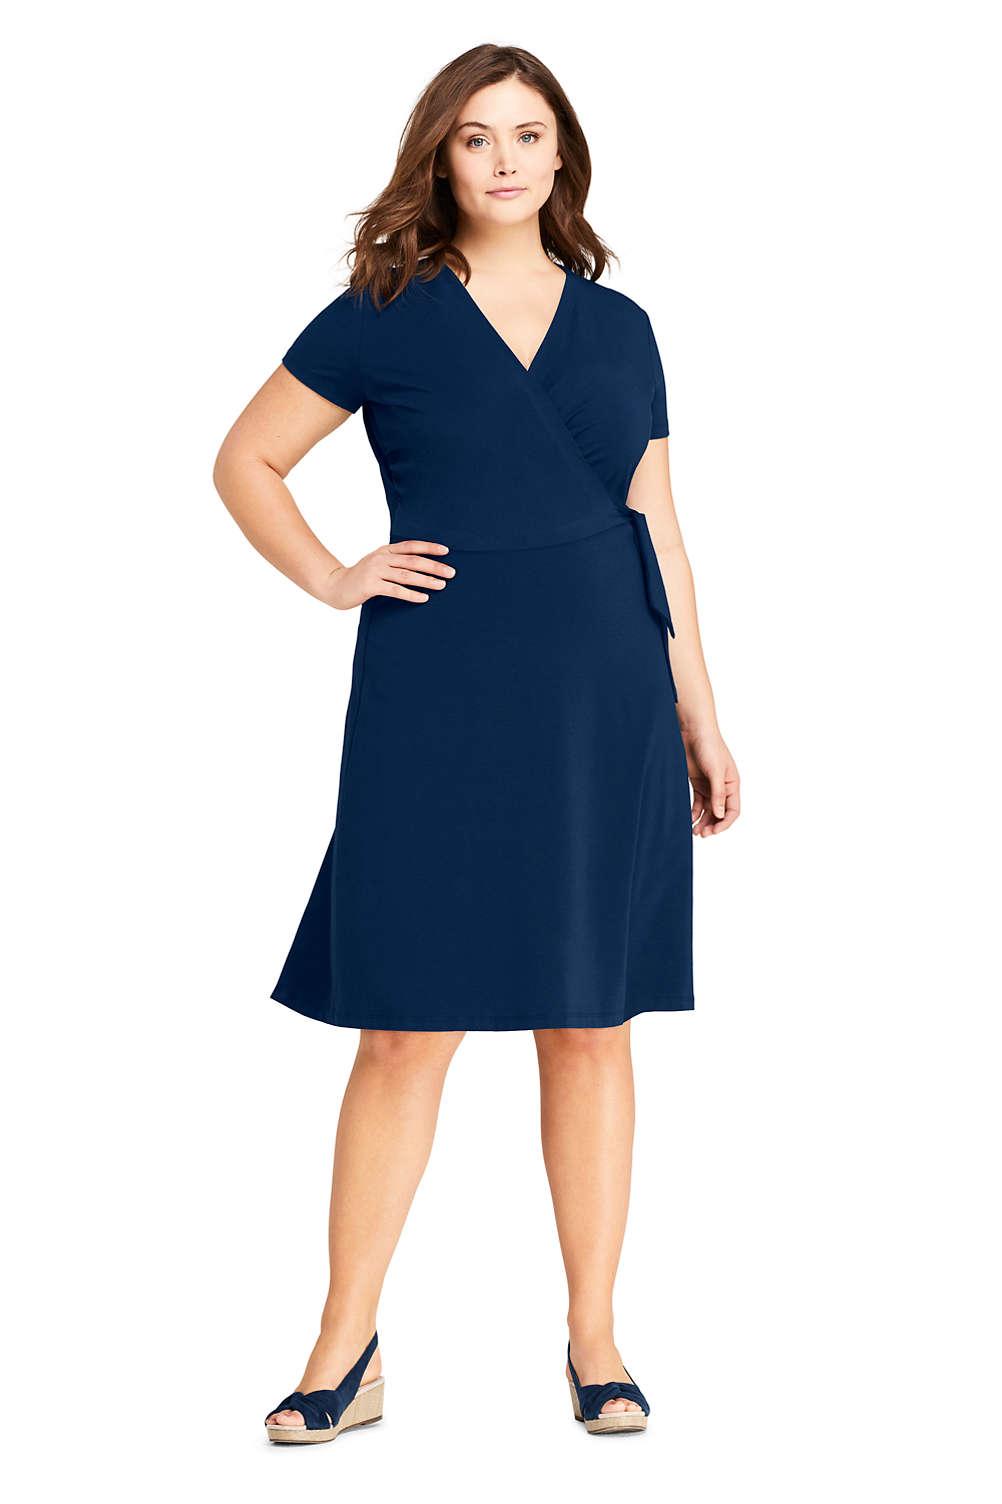 Women\'s Plus Size Short Sleeve Knit Faux Wrap Dress from Lands\' End